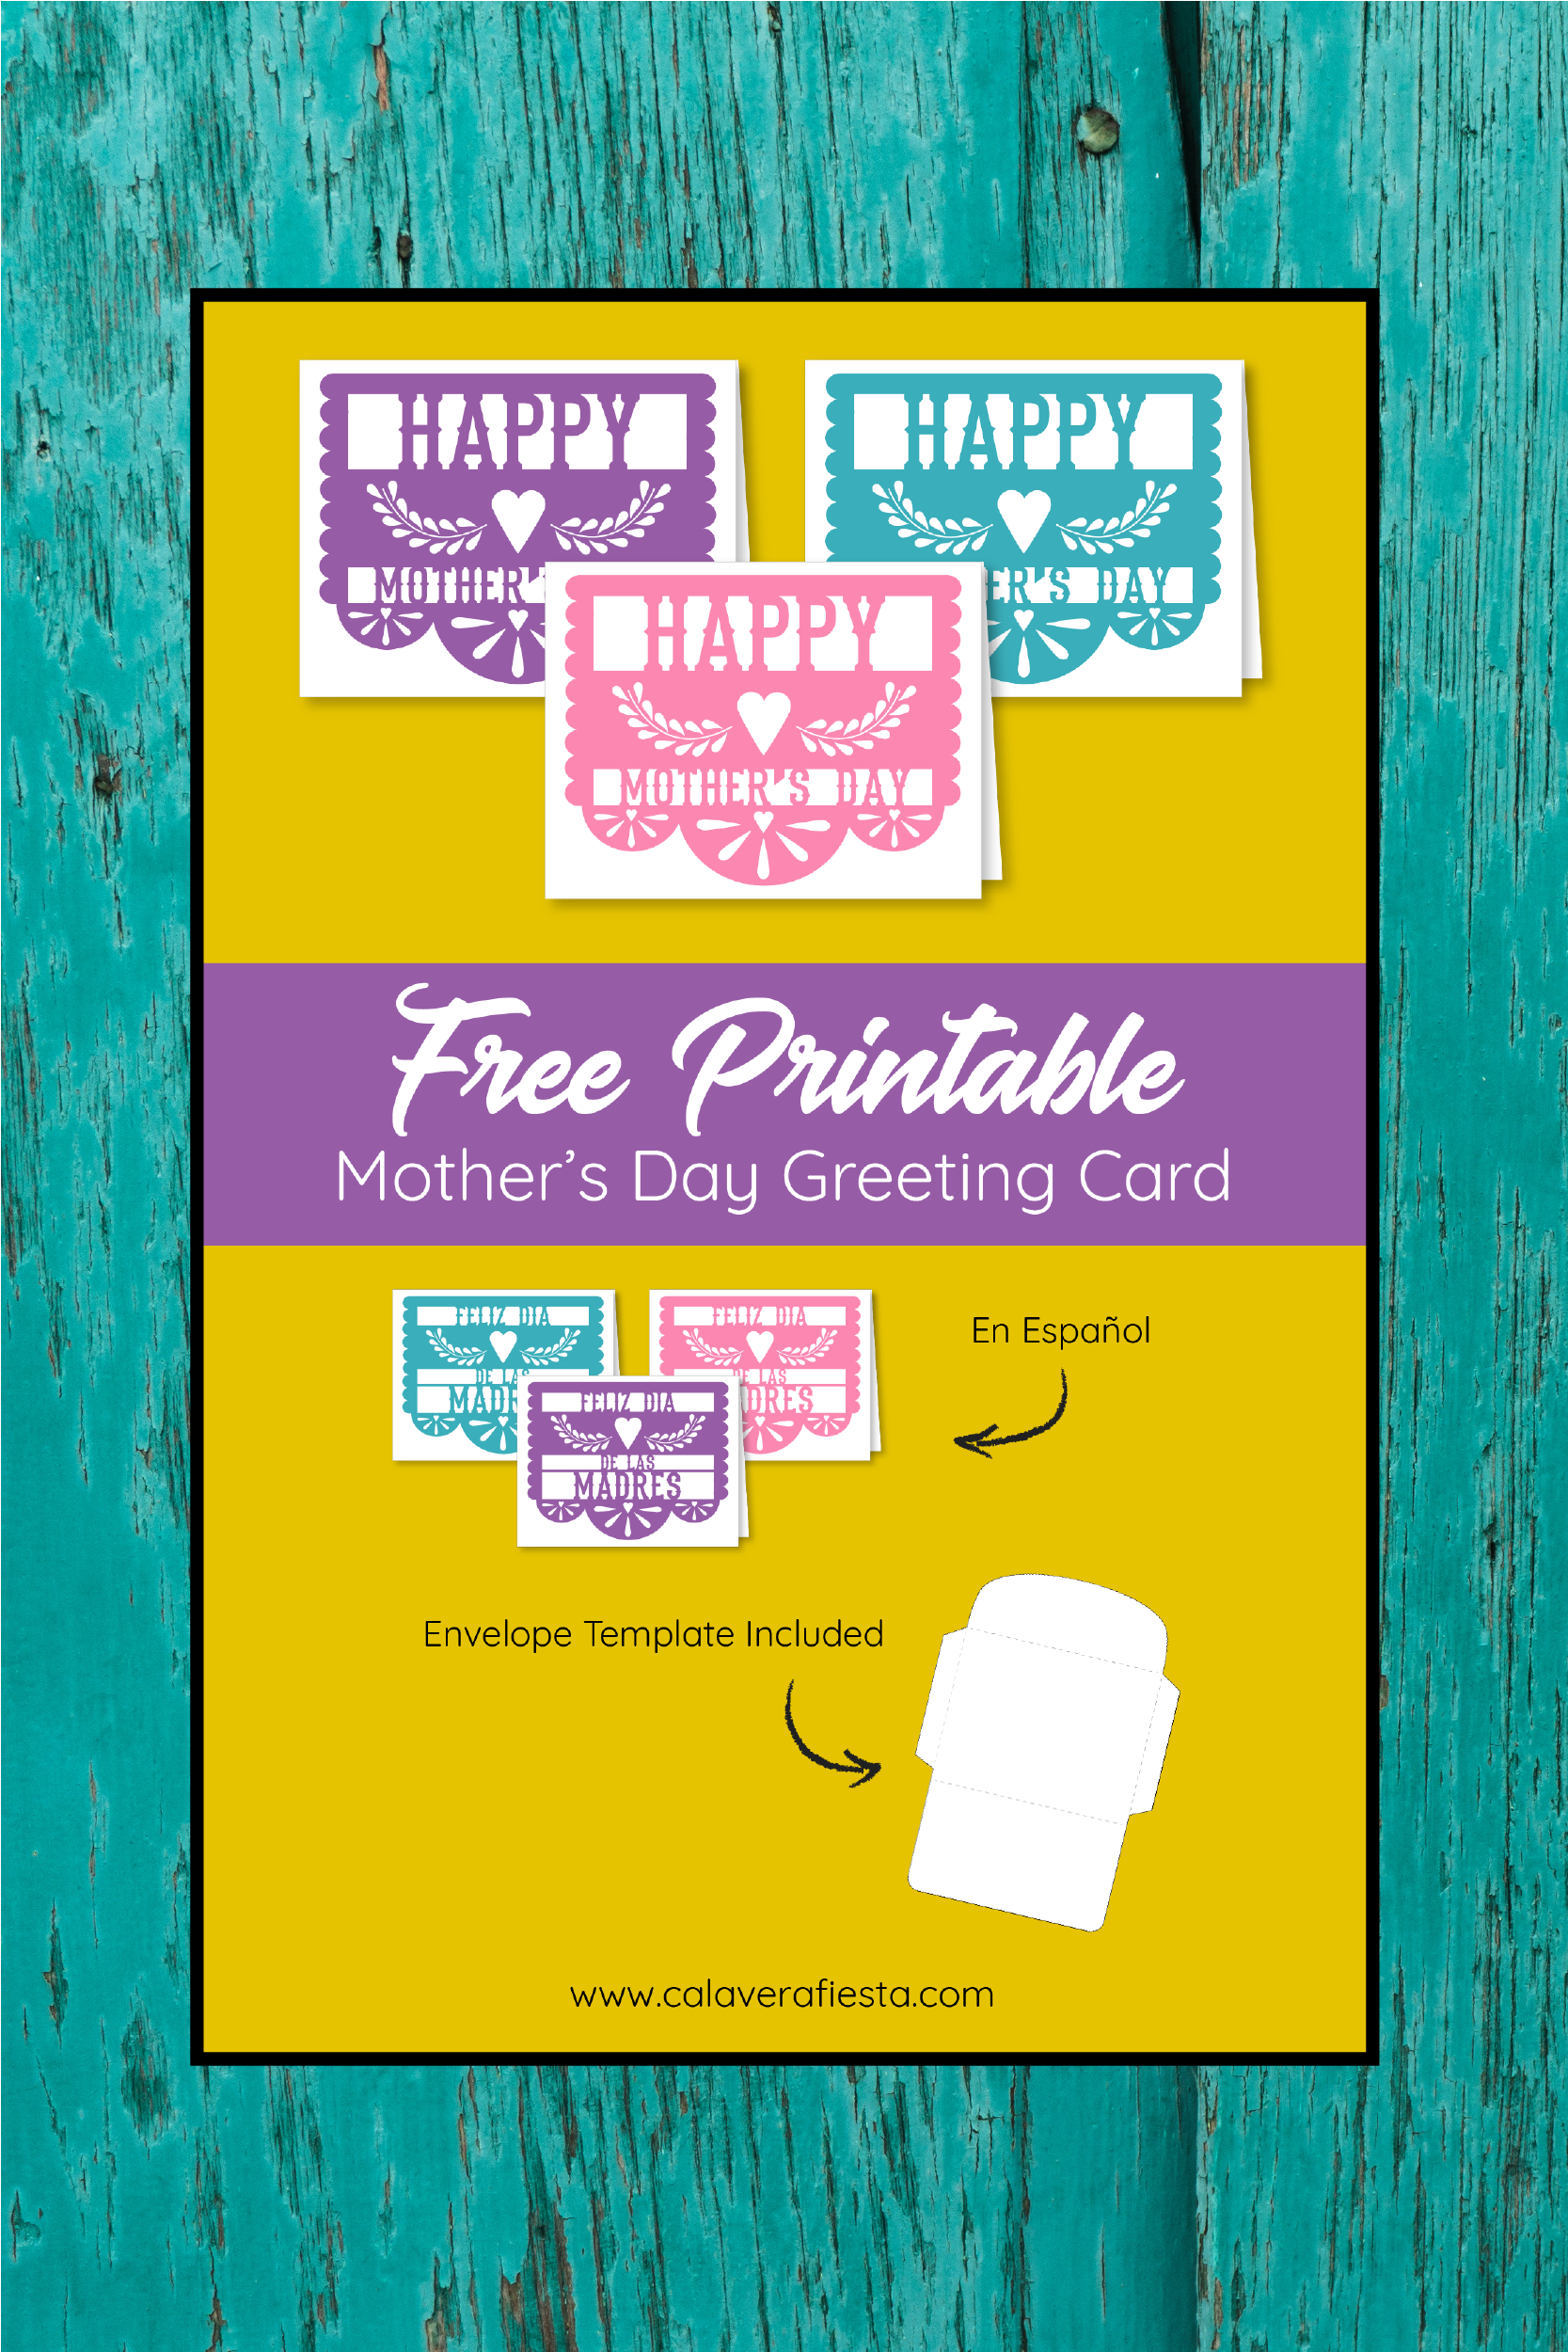 image regarding Papel Picado Template Printable identified as Moms Working day Papel Picado Printable Card - Calavera Fiesta